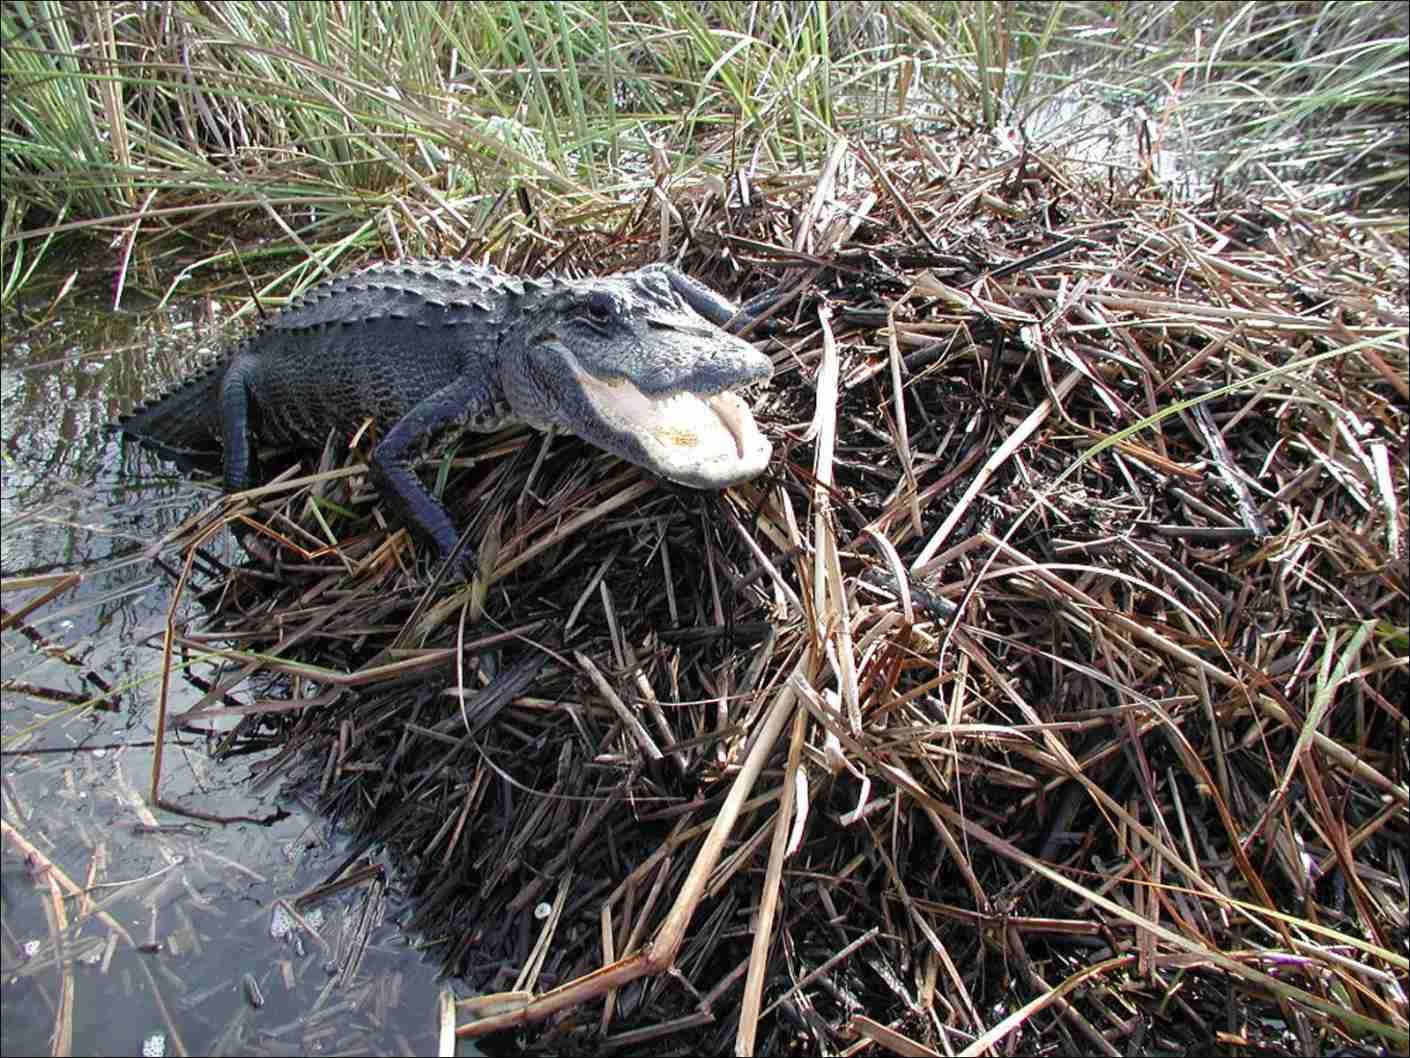 Everglades National Park Alligator